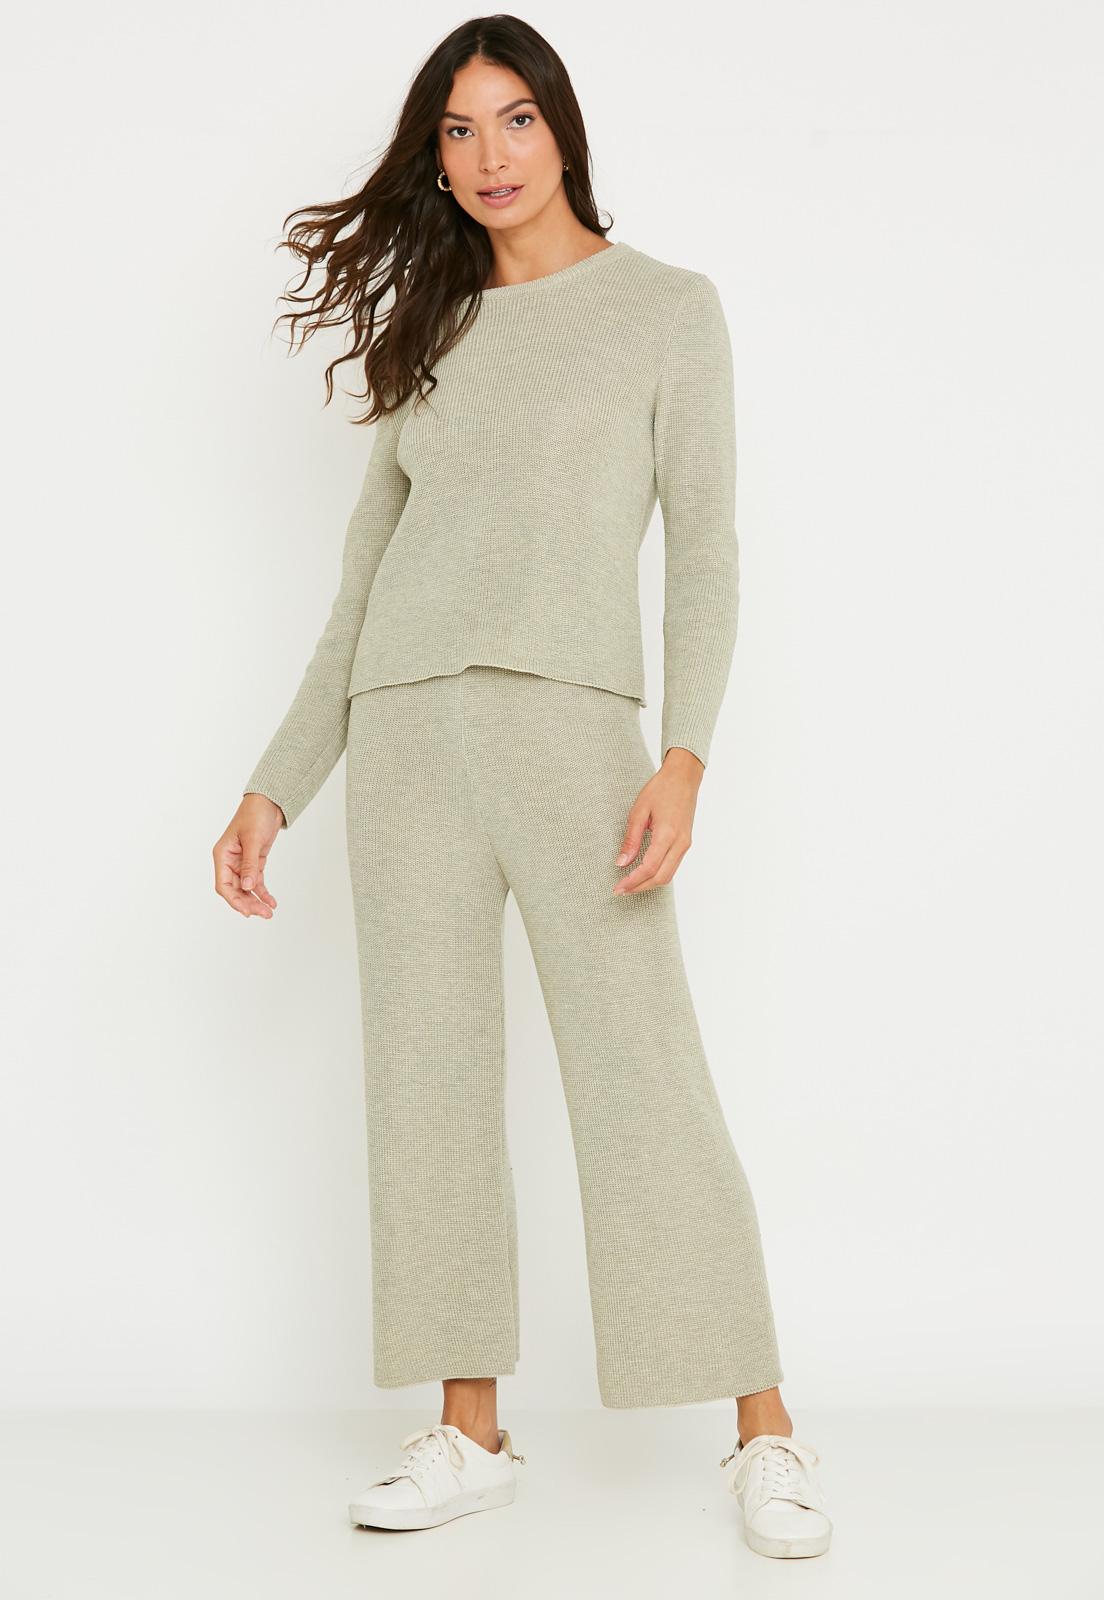 Conjunto de tricot calça pantalona e blusa manga longa - Bege